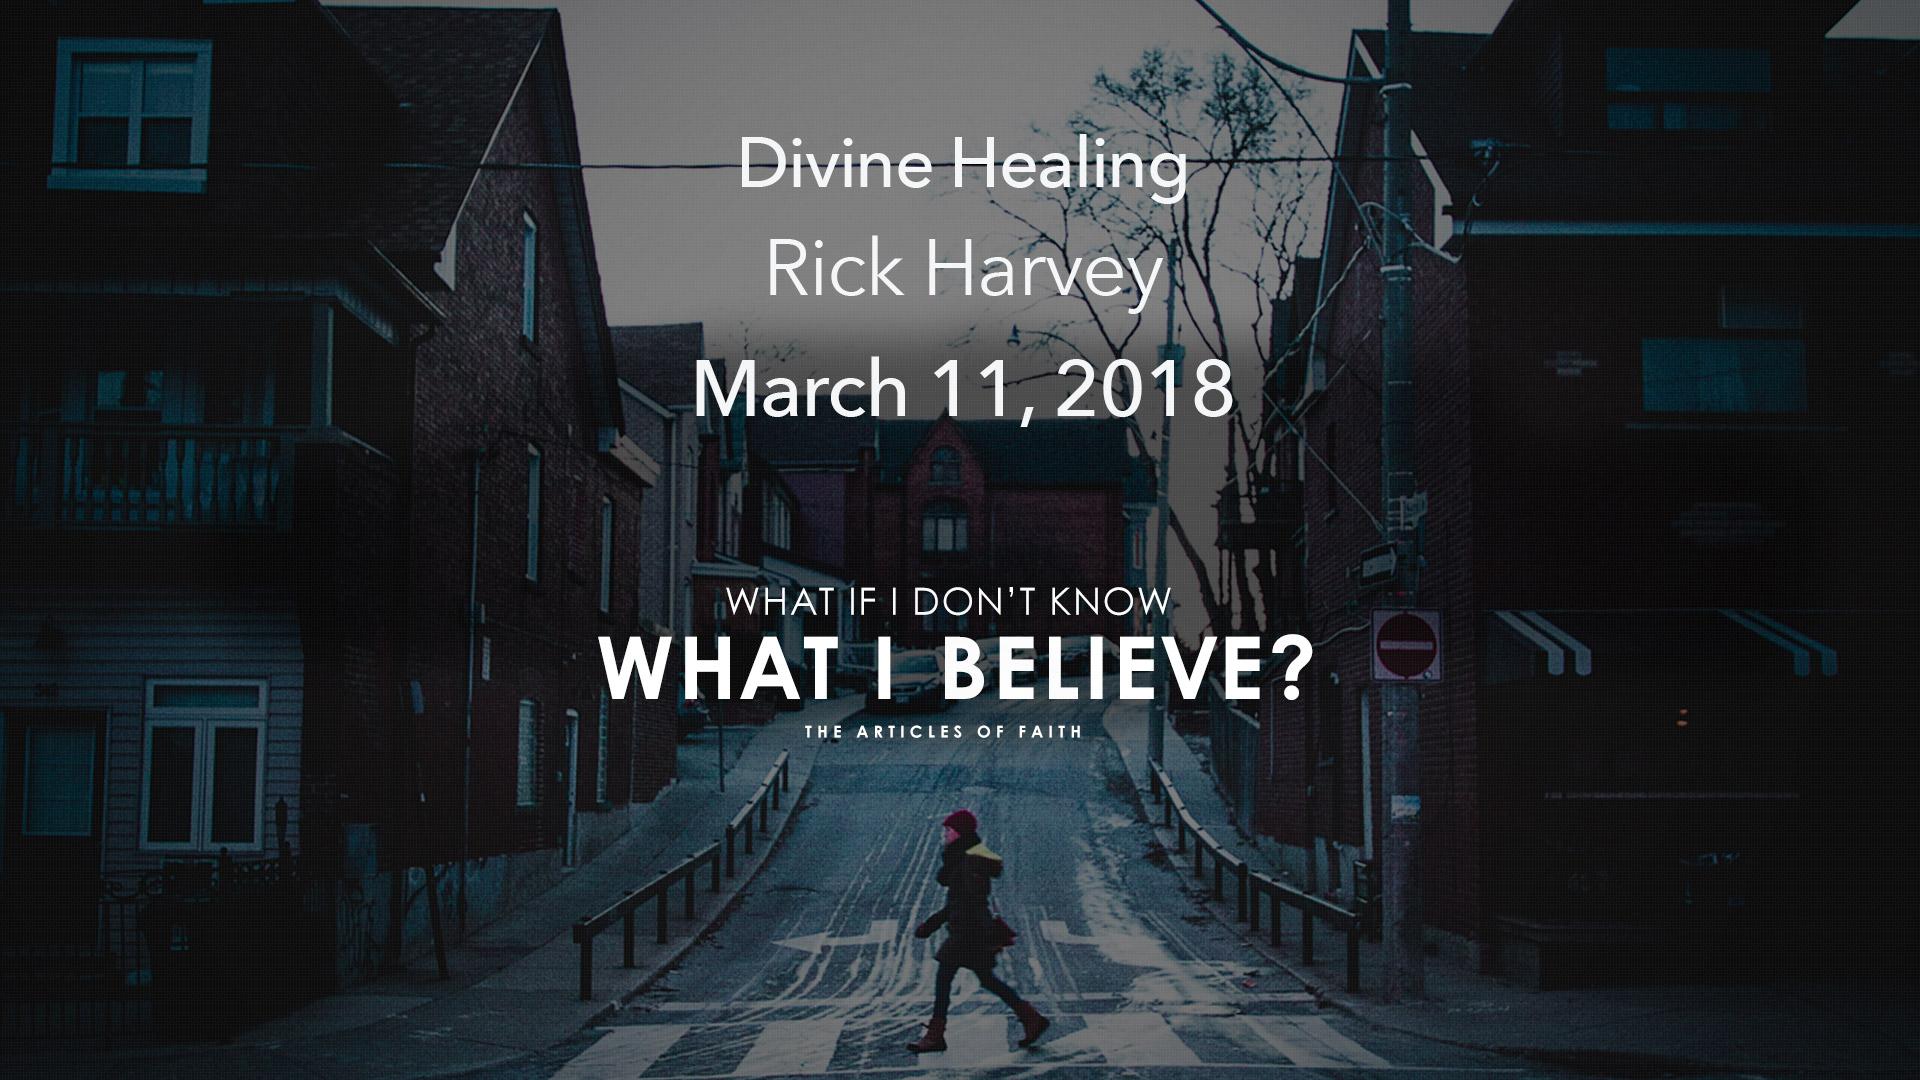 Believe2018_Vimeo_Mar11.jpg